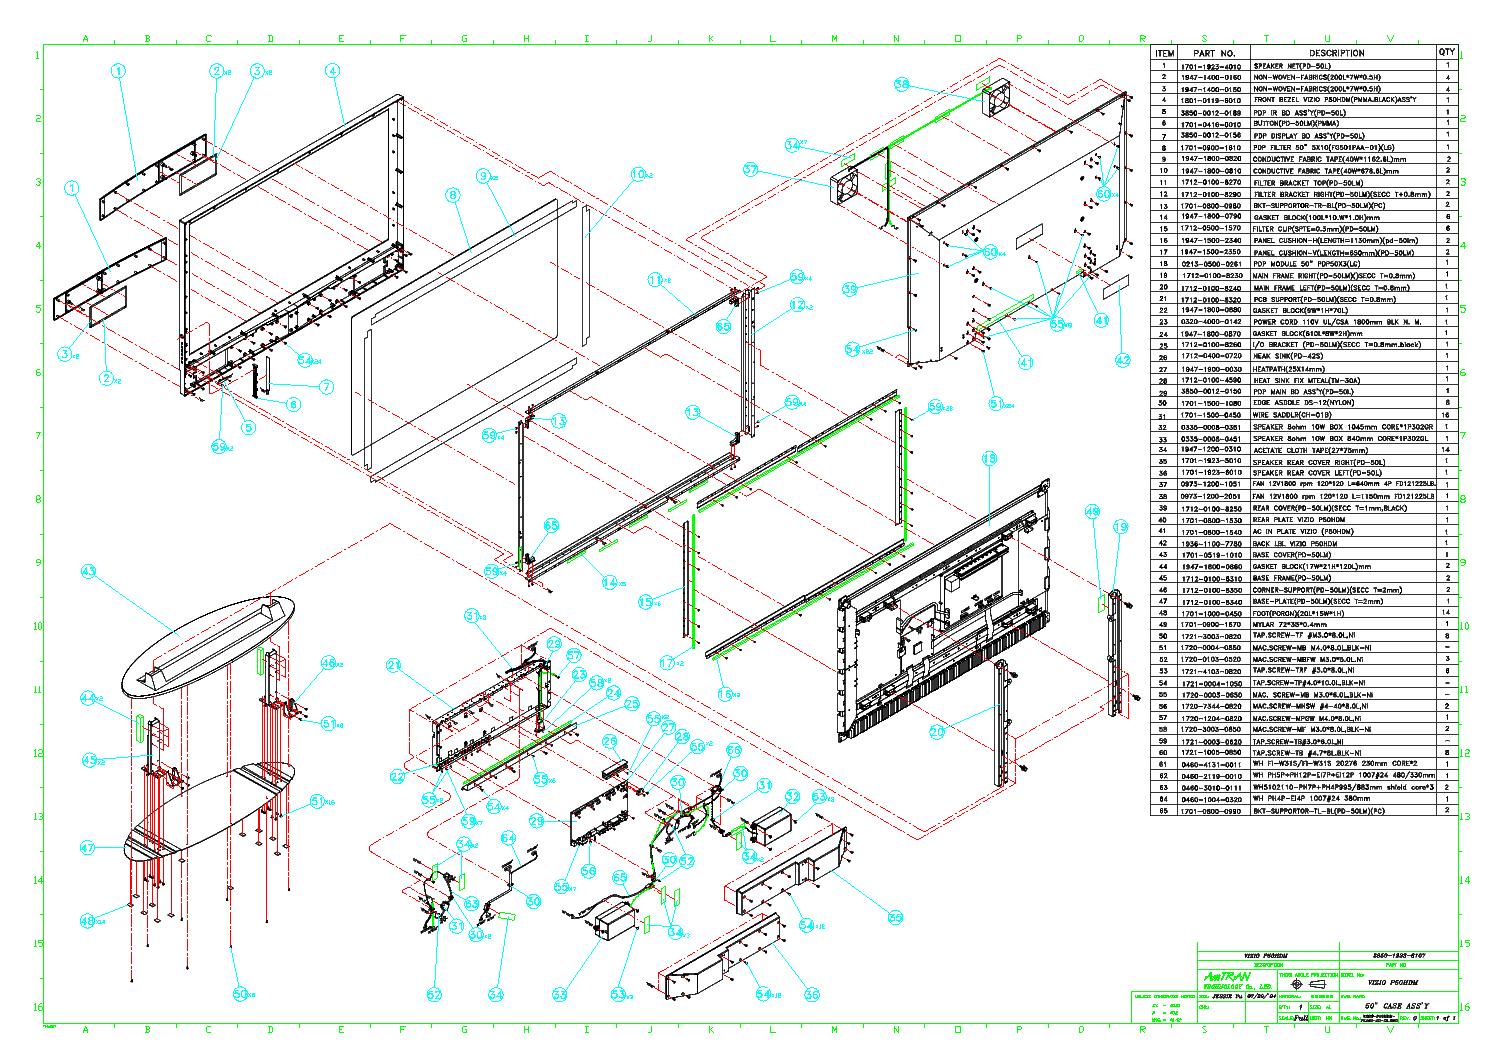 VIZIO P50HDM PARTS MANUAL Service Manual download ... on bose schematics, rca schematics, yamaha schematics, magnavox schematics, zenith schematics, samsung schematics,